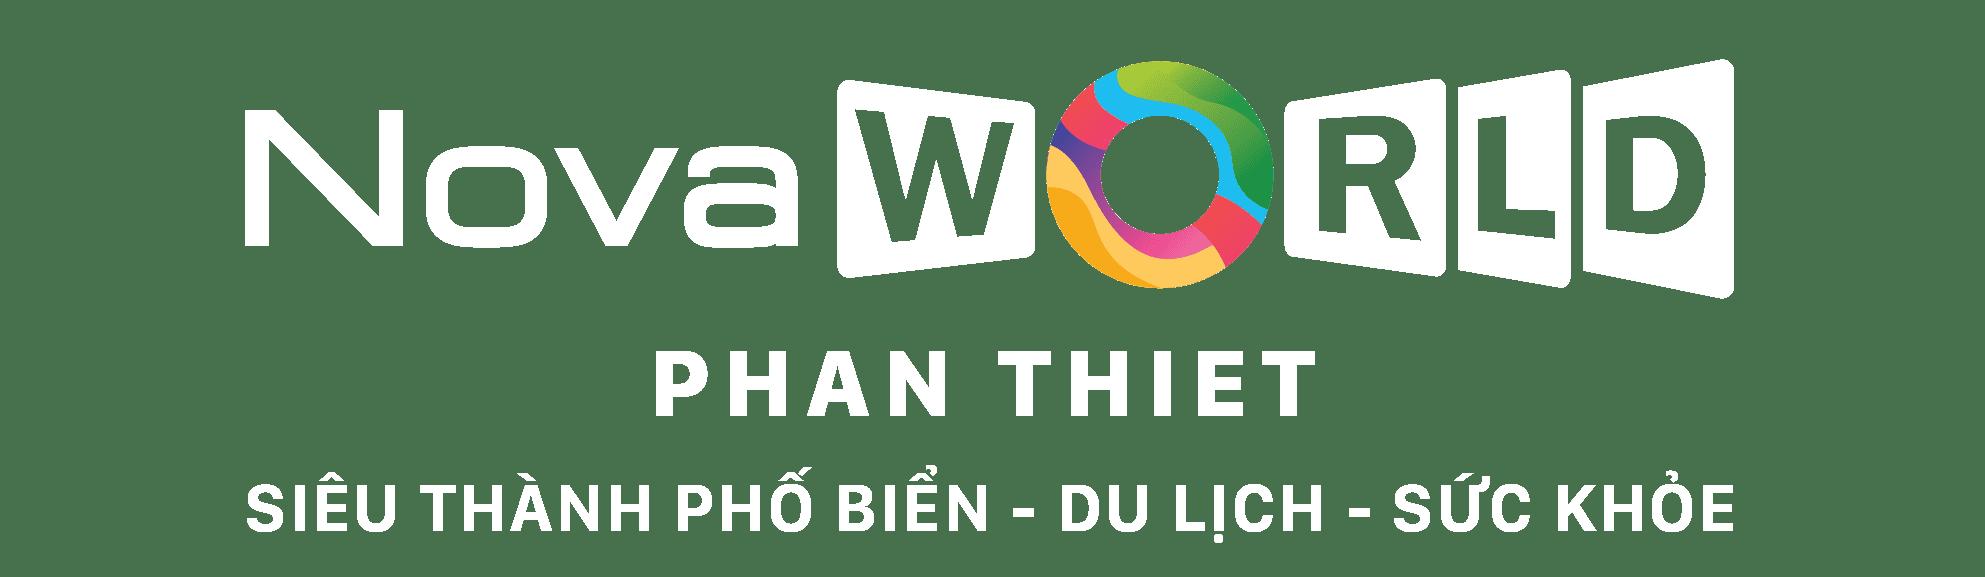 logo NovaWorld Phan Thiết Novaland